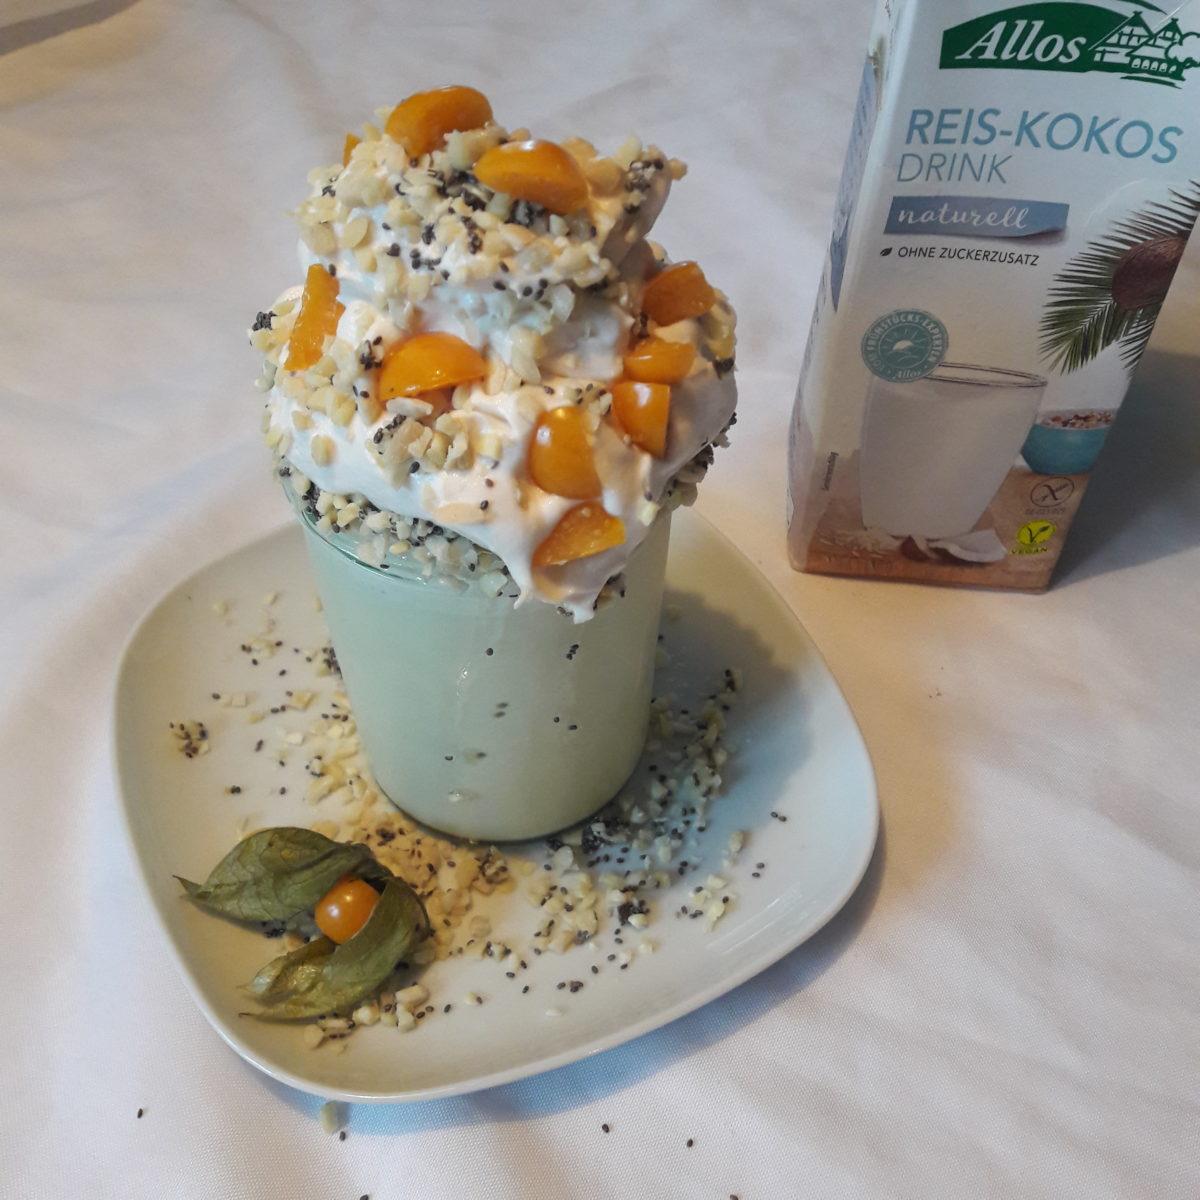 Rezept: Sommerlicher Fruchtshake aka FREAKSHAKE mit Reis-Kokos-Drink von Allos